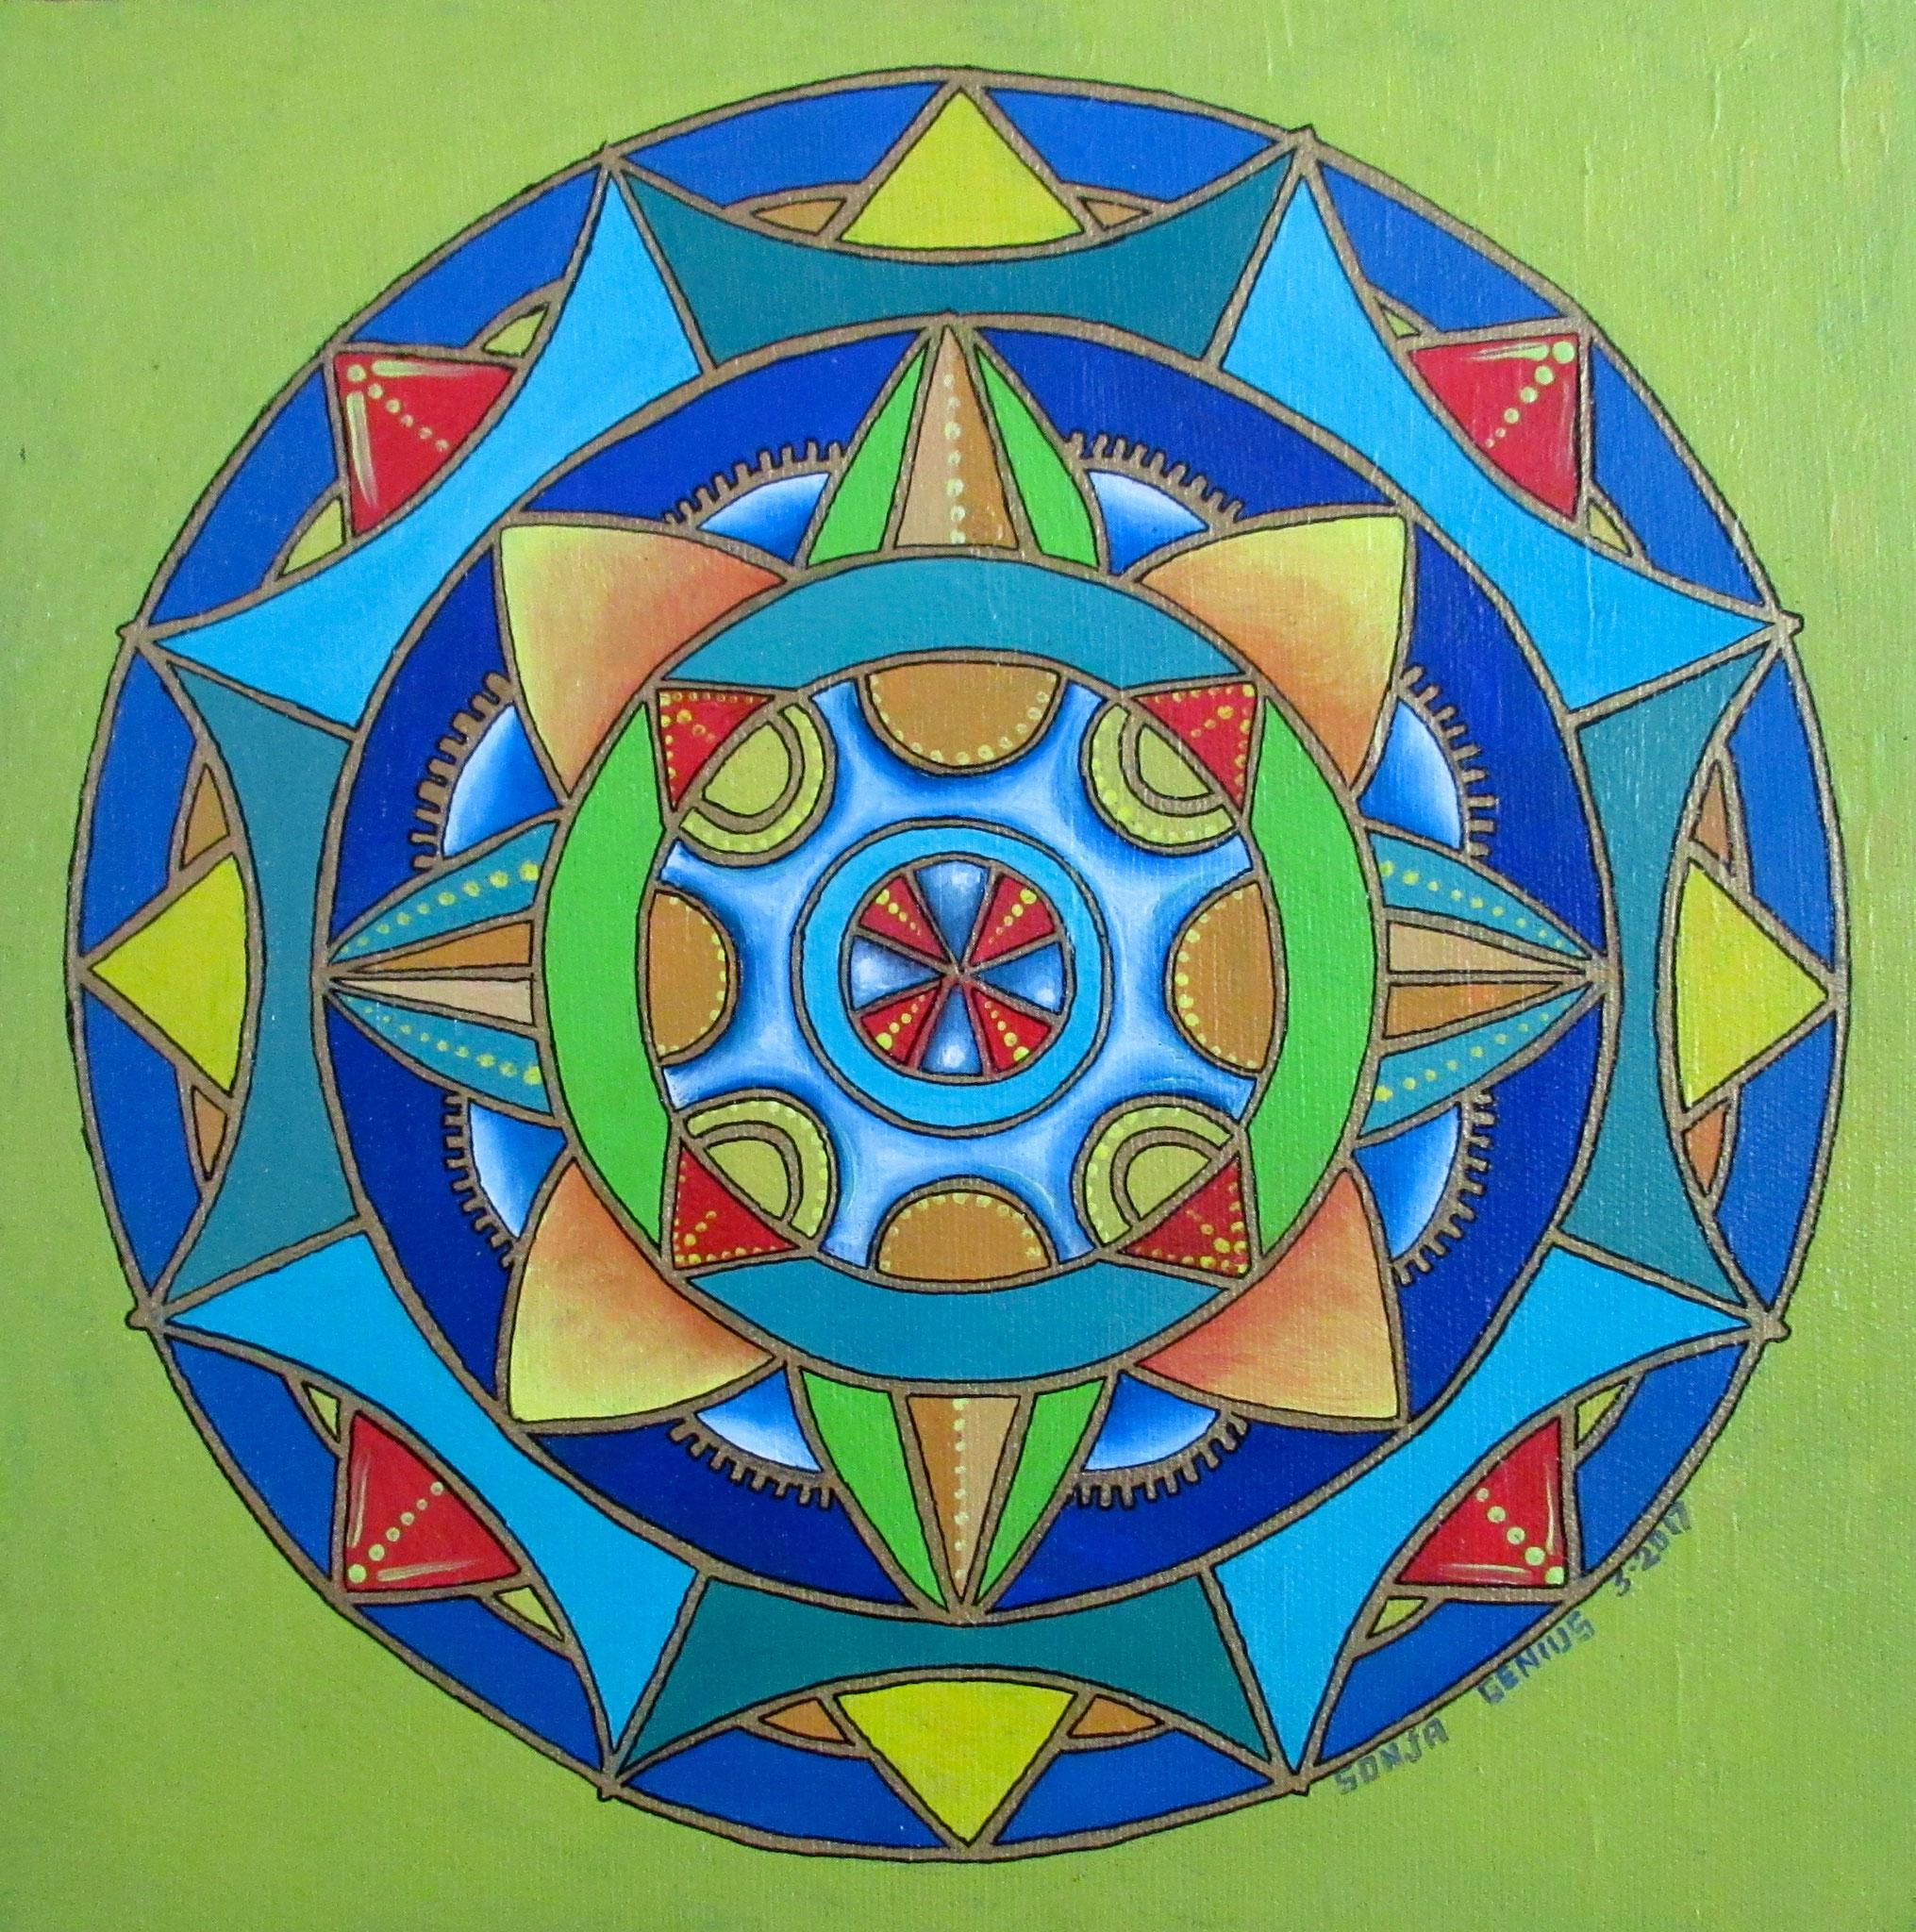 Hex Mandala II, oil on canvas 10x10, March 2017 (1)